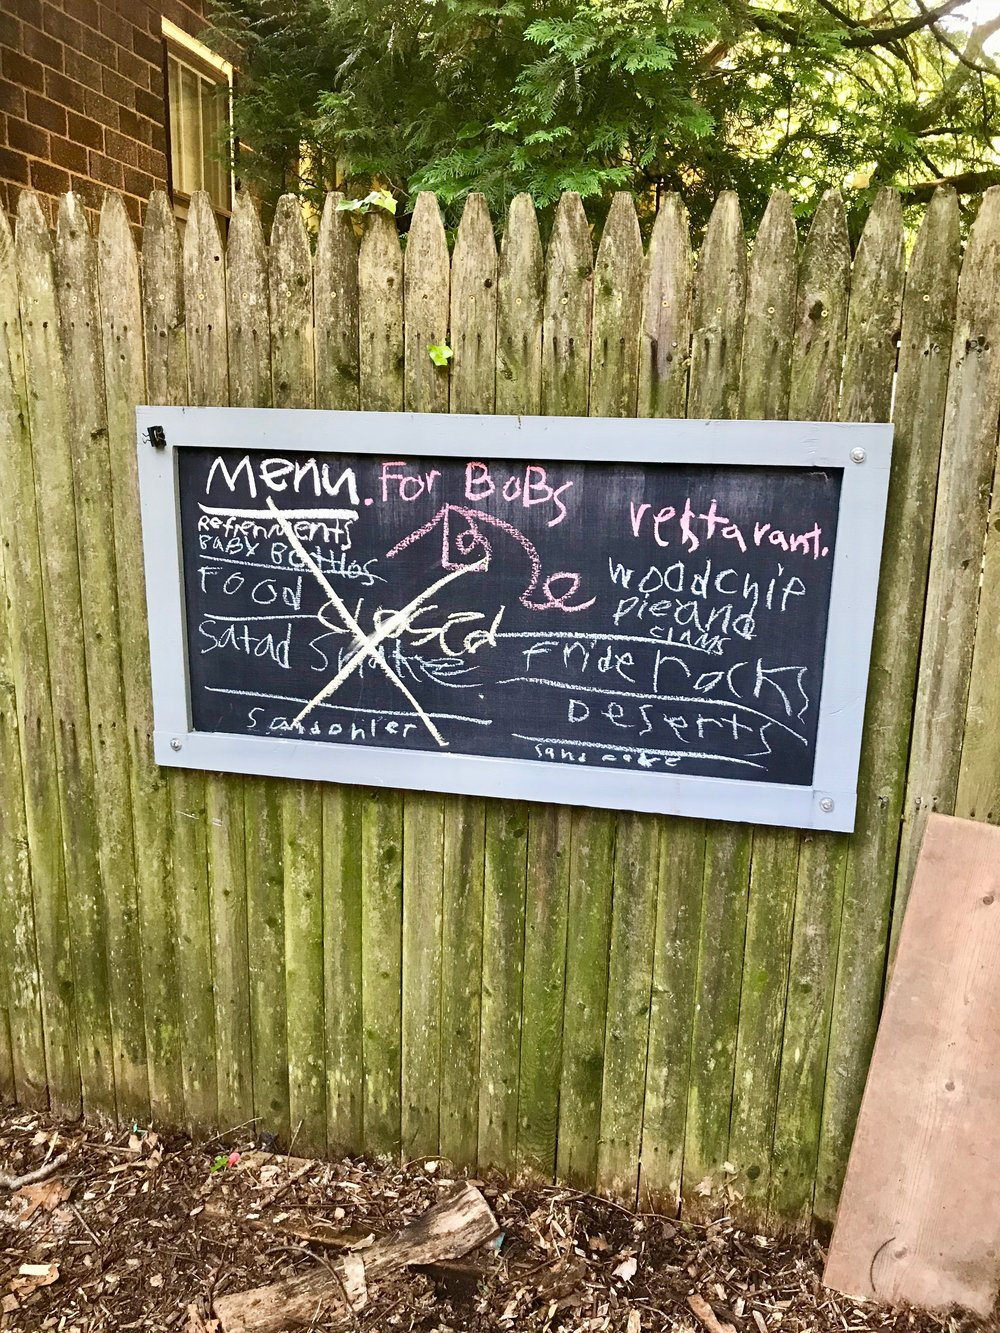 Bob's circa 2018. Undergoing renovations and menu changes.